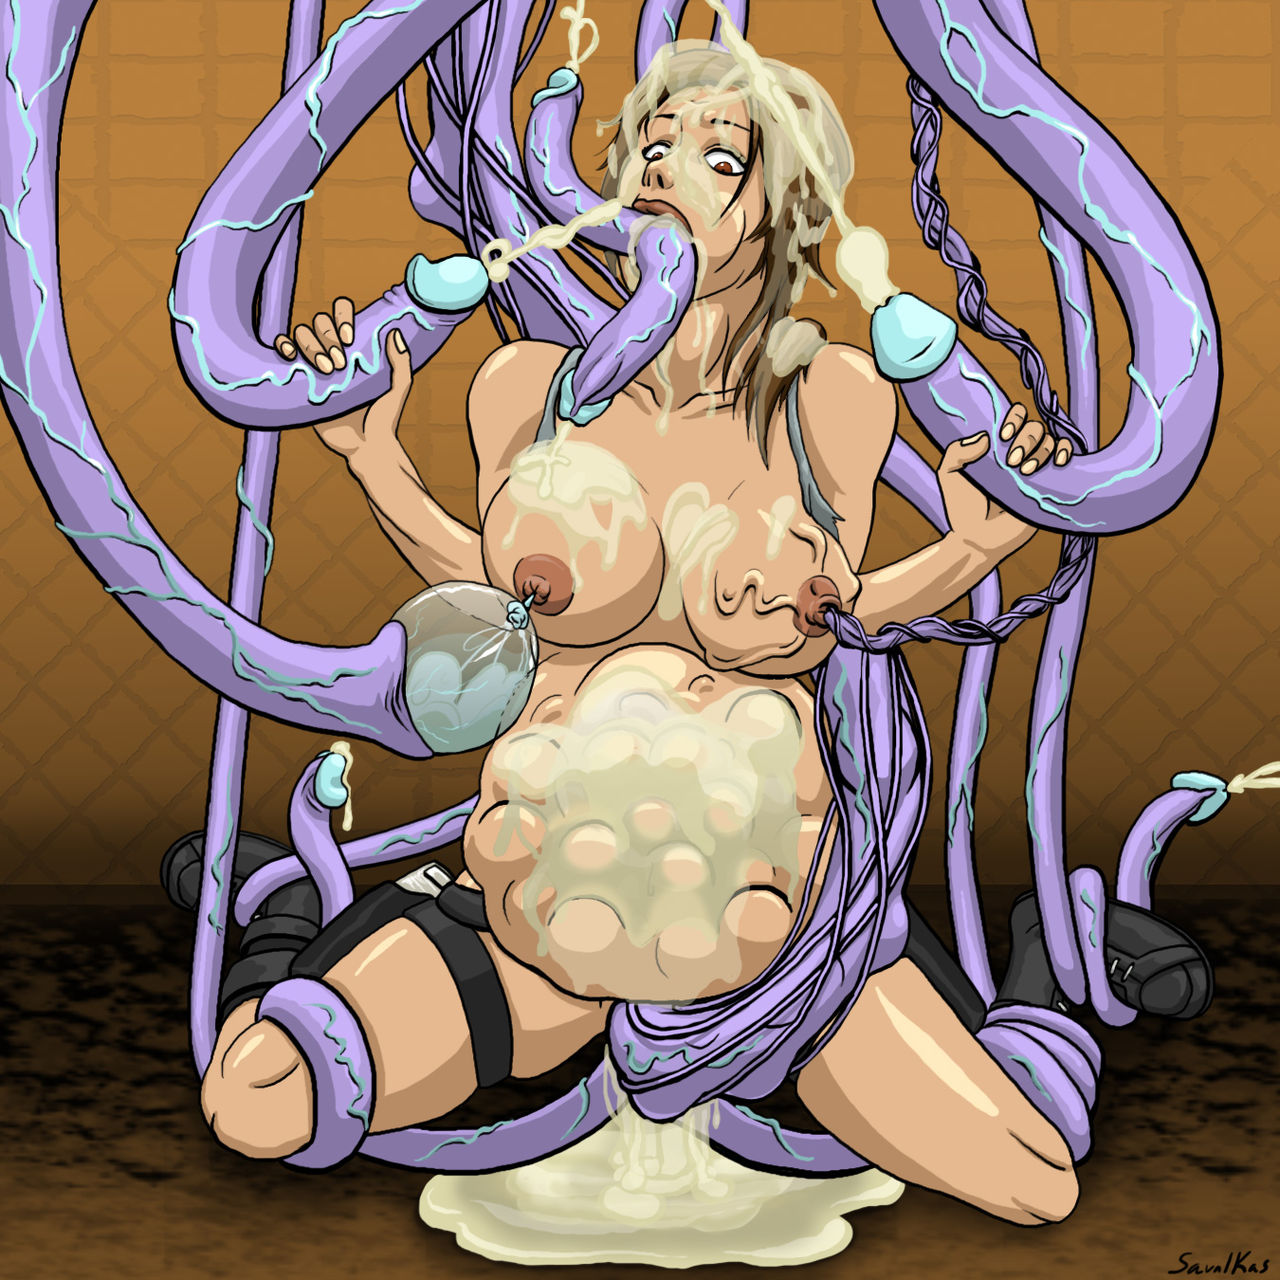 Tentacle monster hentai comics